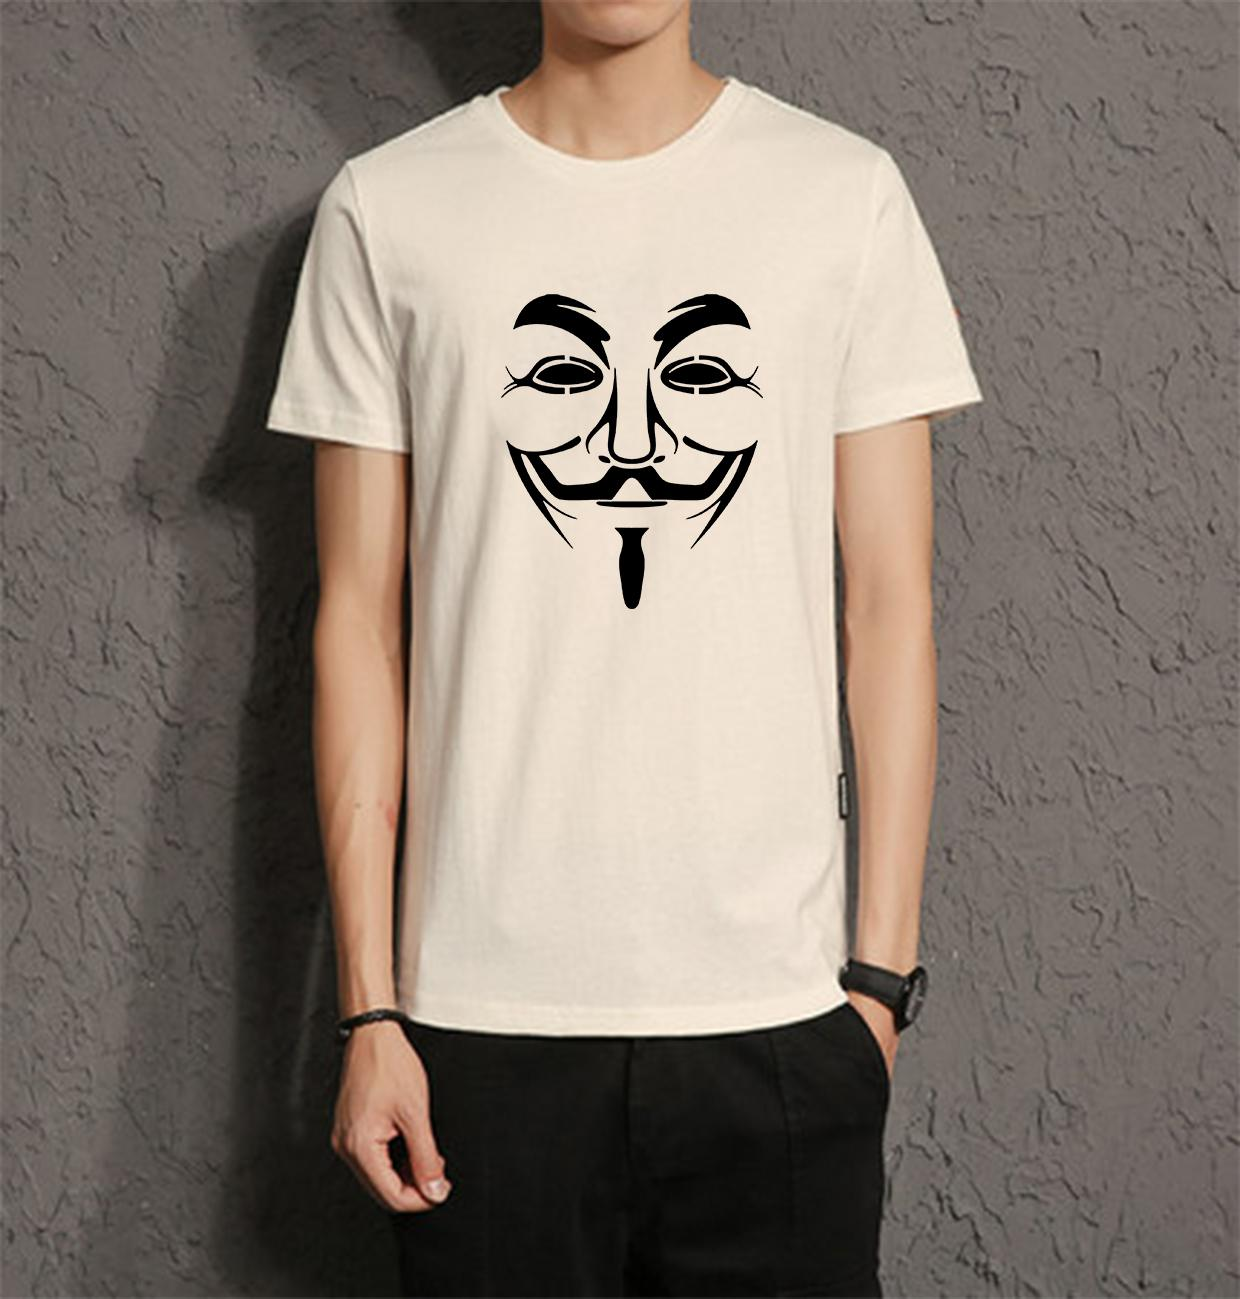 Discount Most Popular T Shirt Designs | 2017 Most Popular T Shirt ...